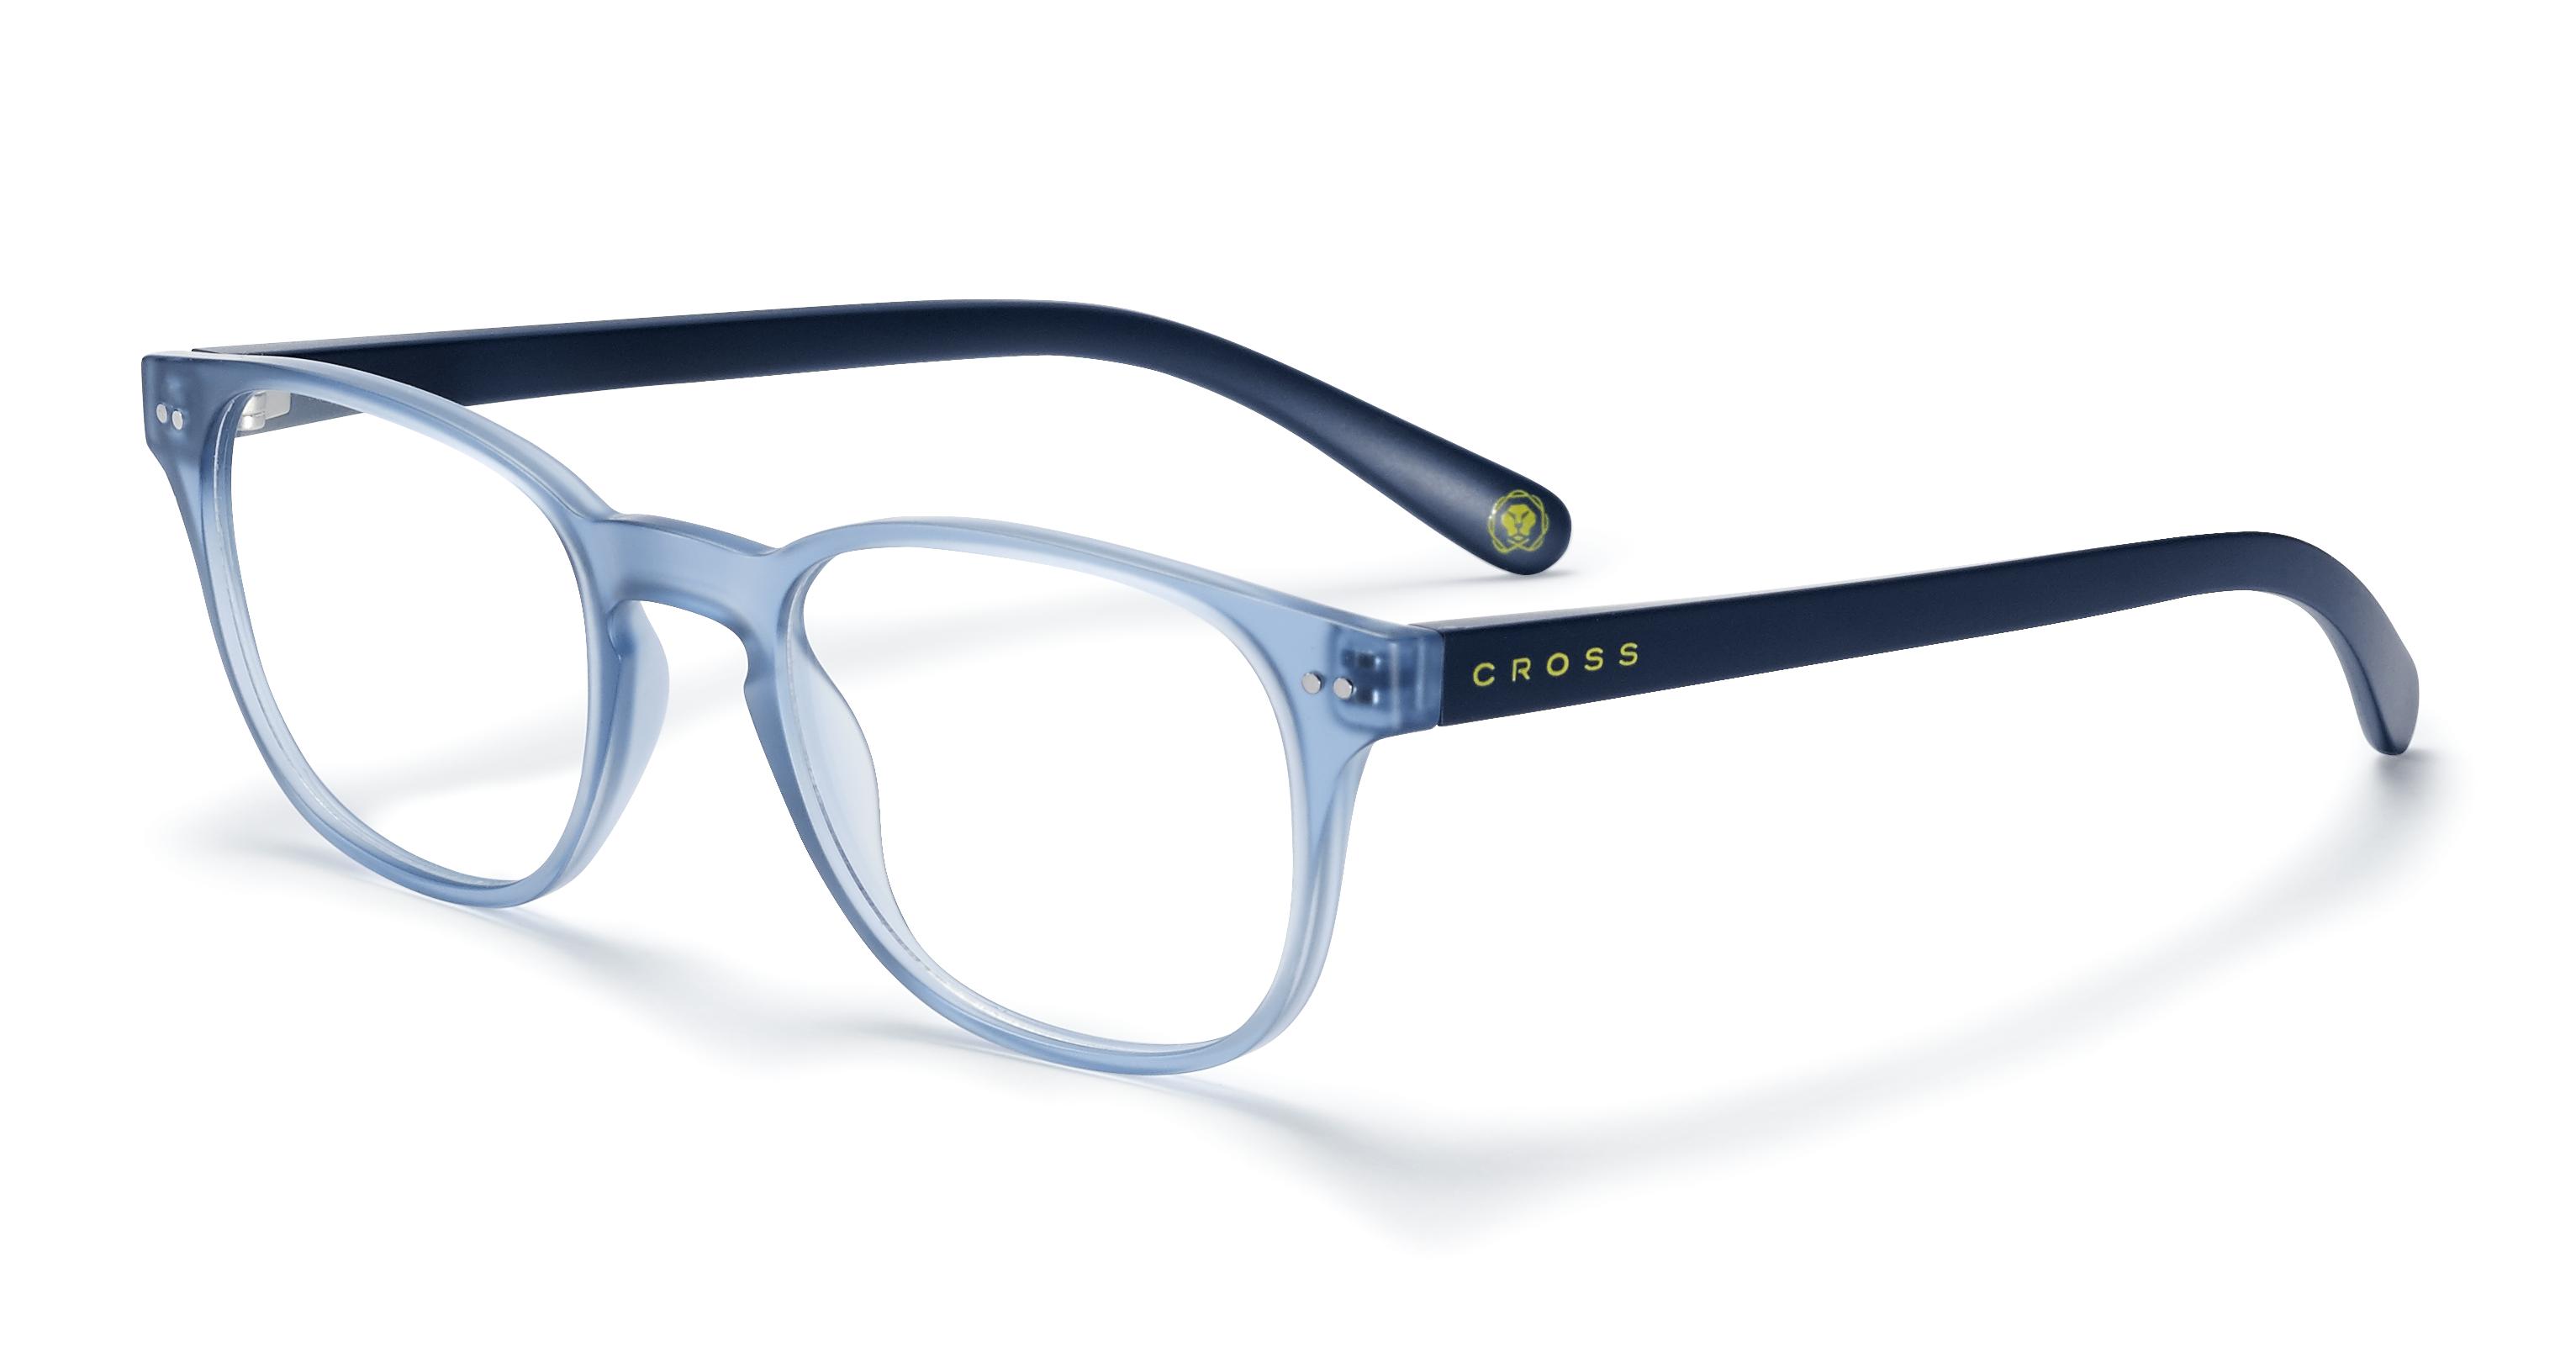 Cross Princeton Reading Glasses